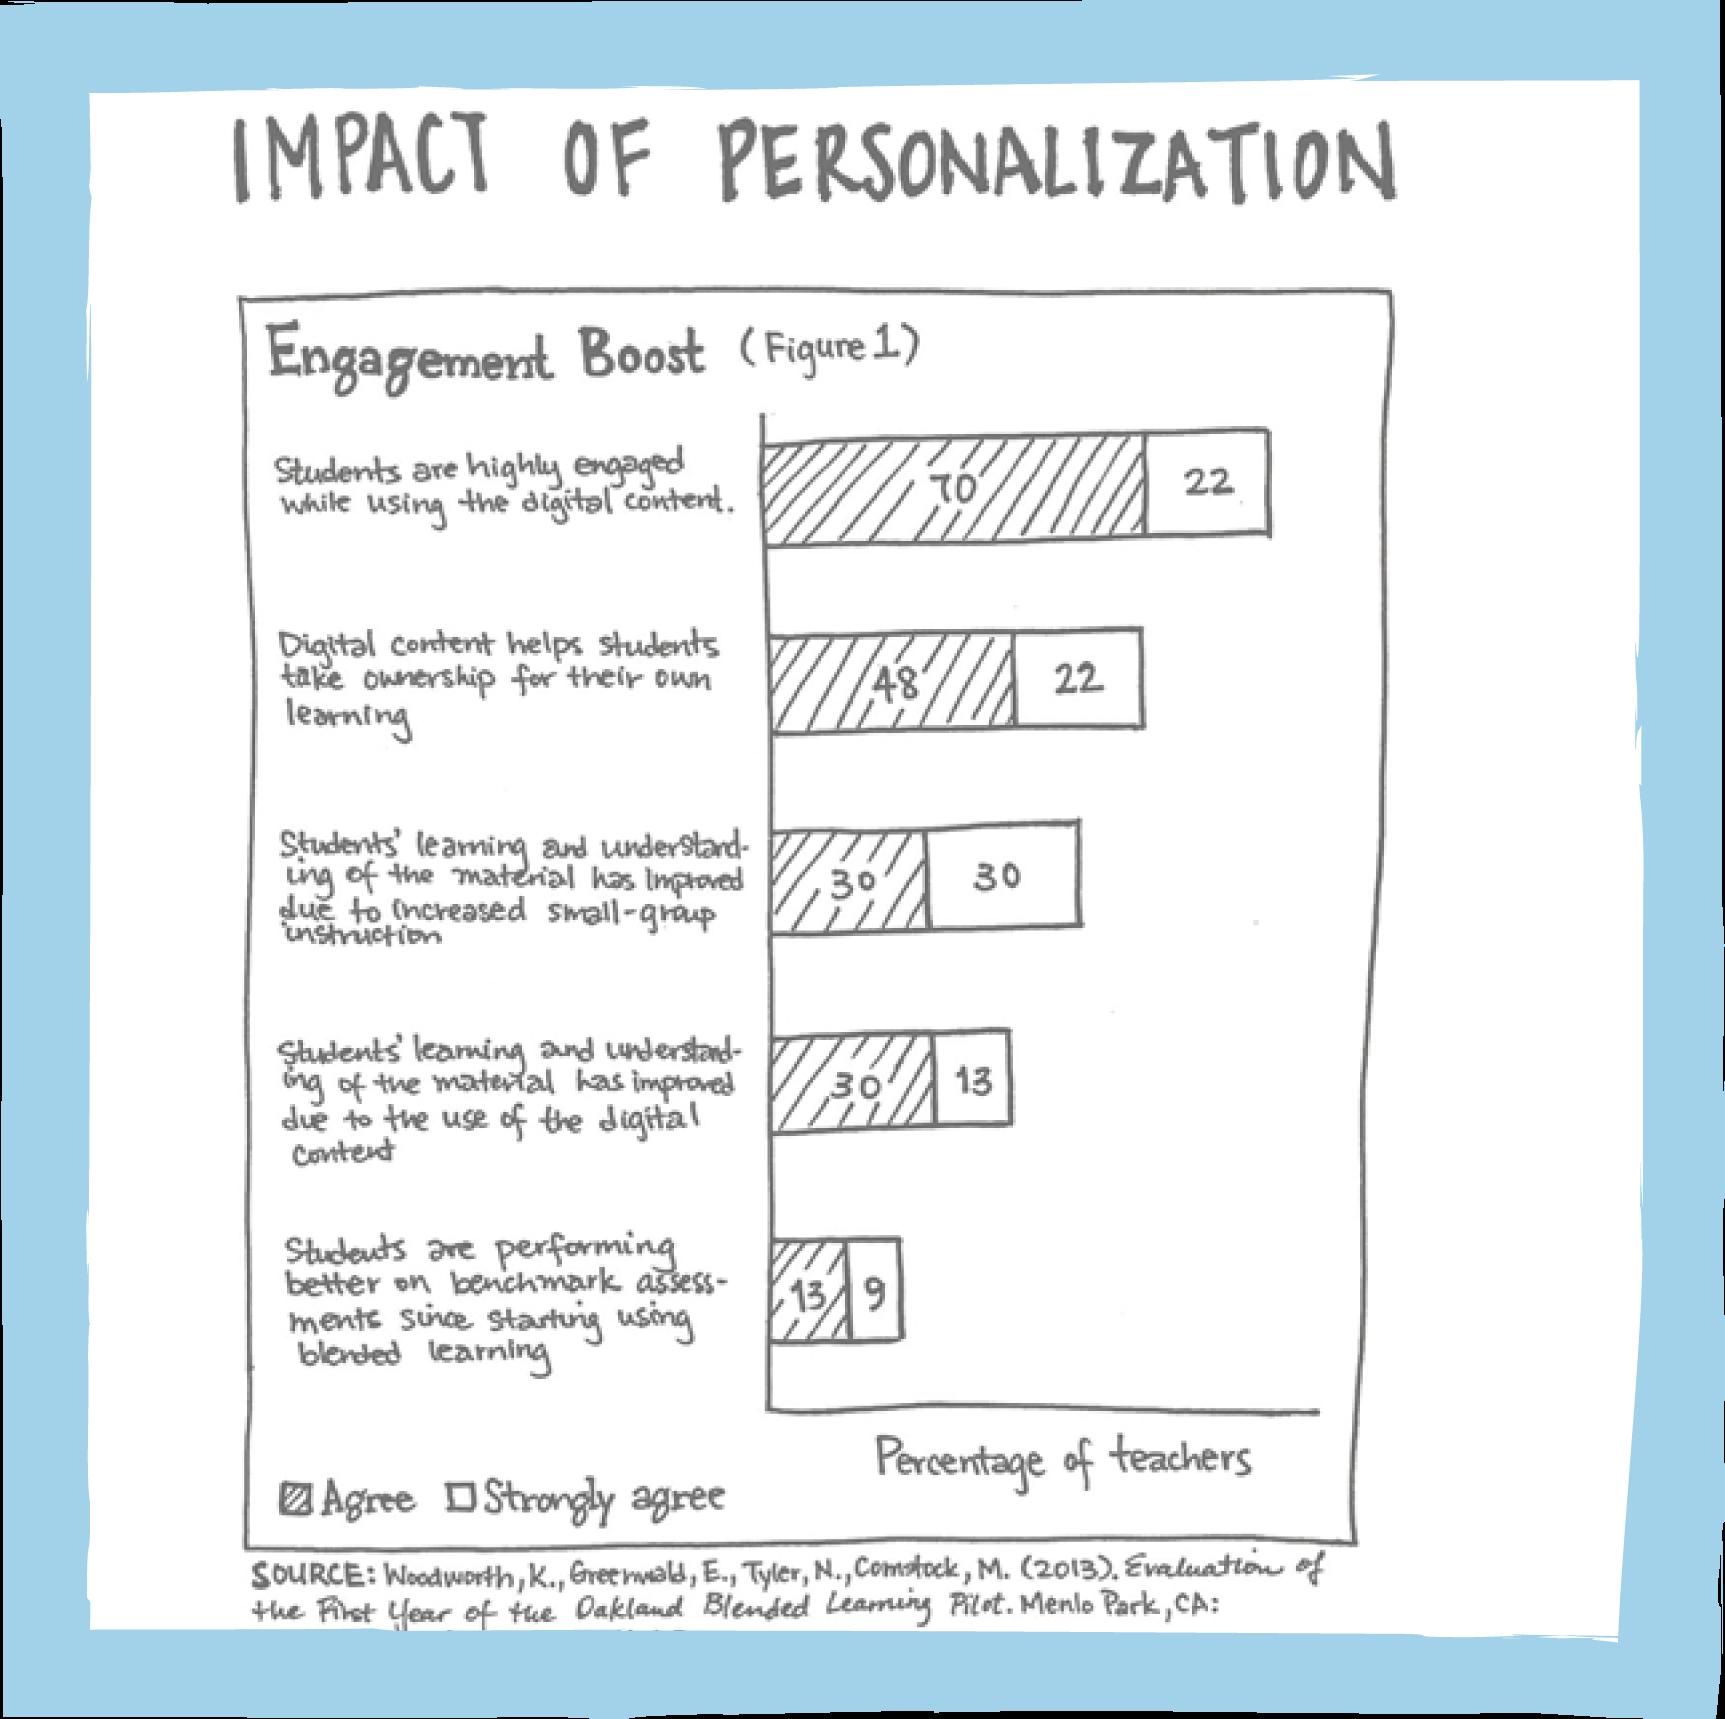 Impact of personalization